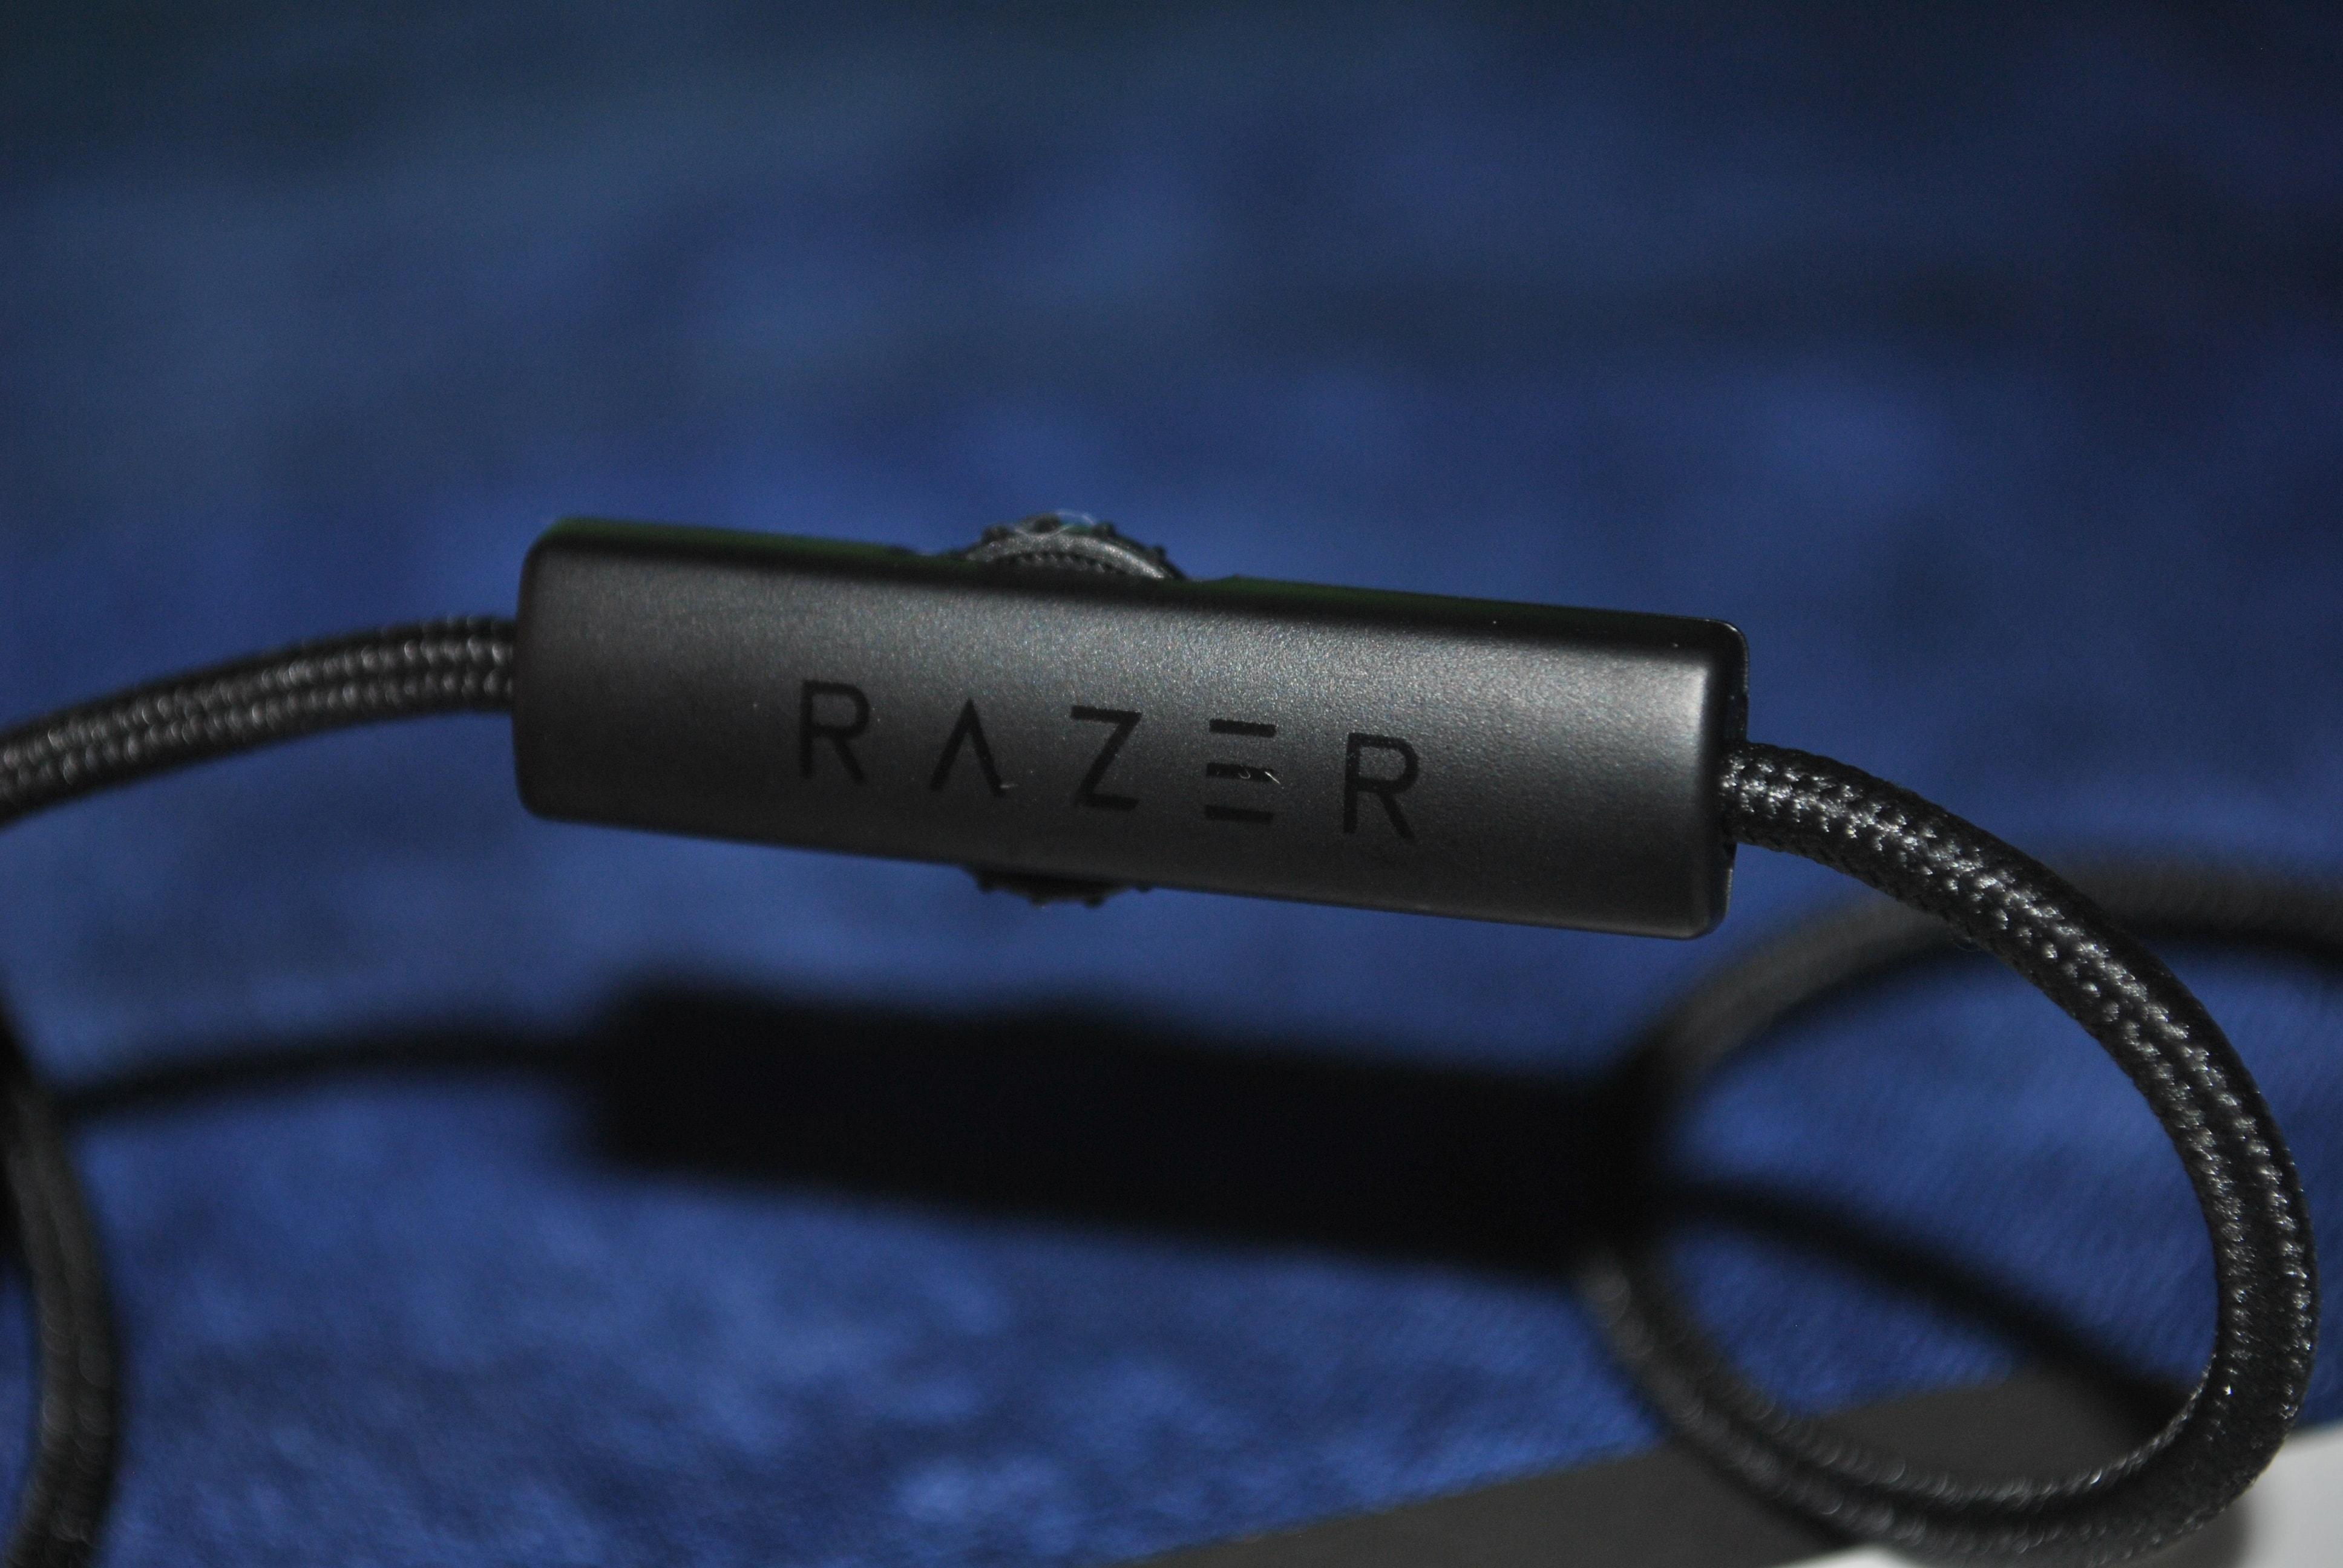 mano war casque razer test avis gamingway headset 9 min. Black Bedroom Furniture Sets. Home Design Ideas